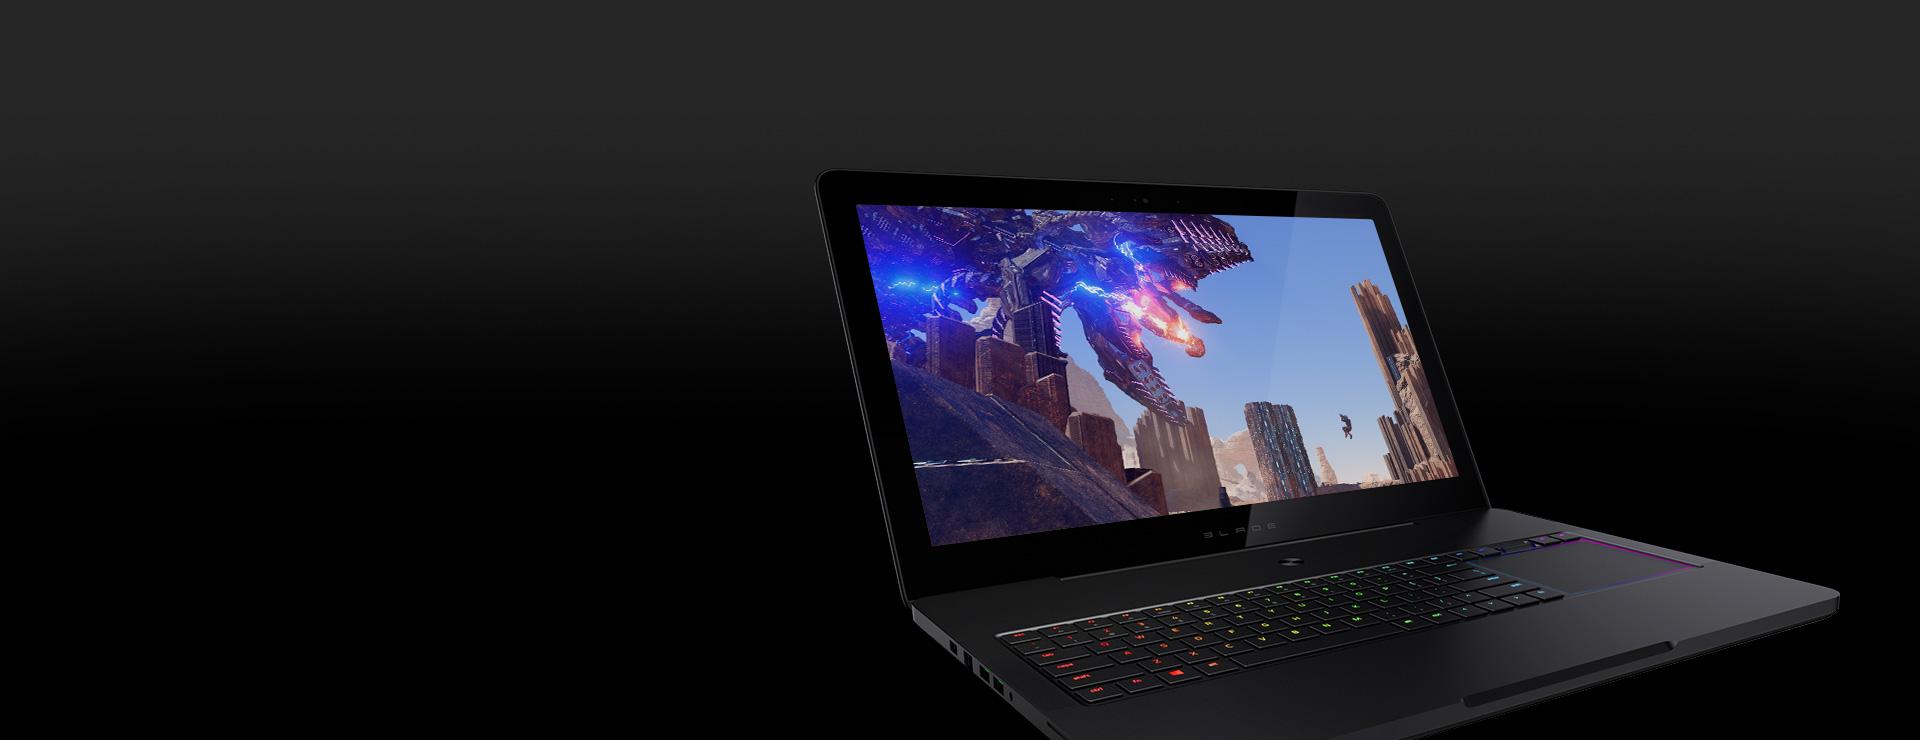 The New Razer Blade Pro V2 - The Desktop in Your Laptop